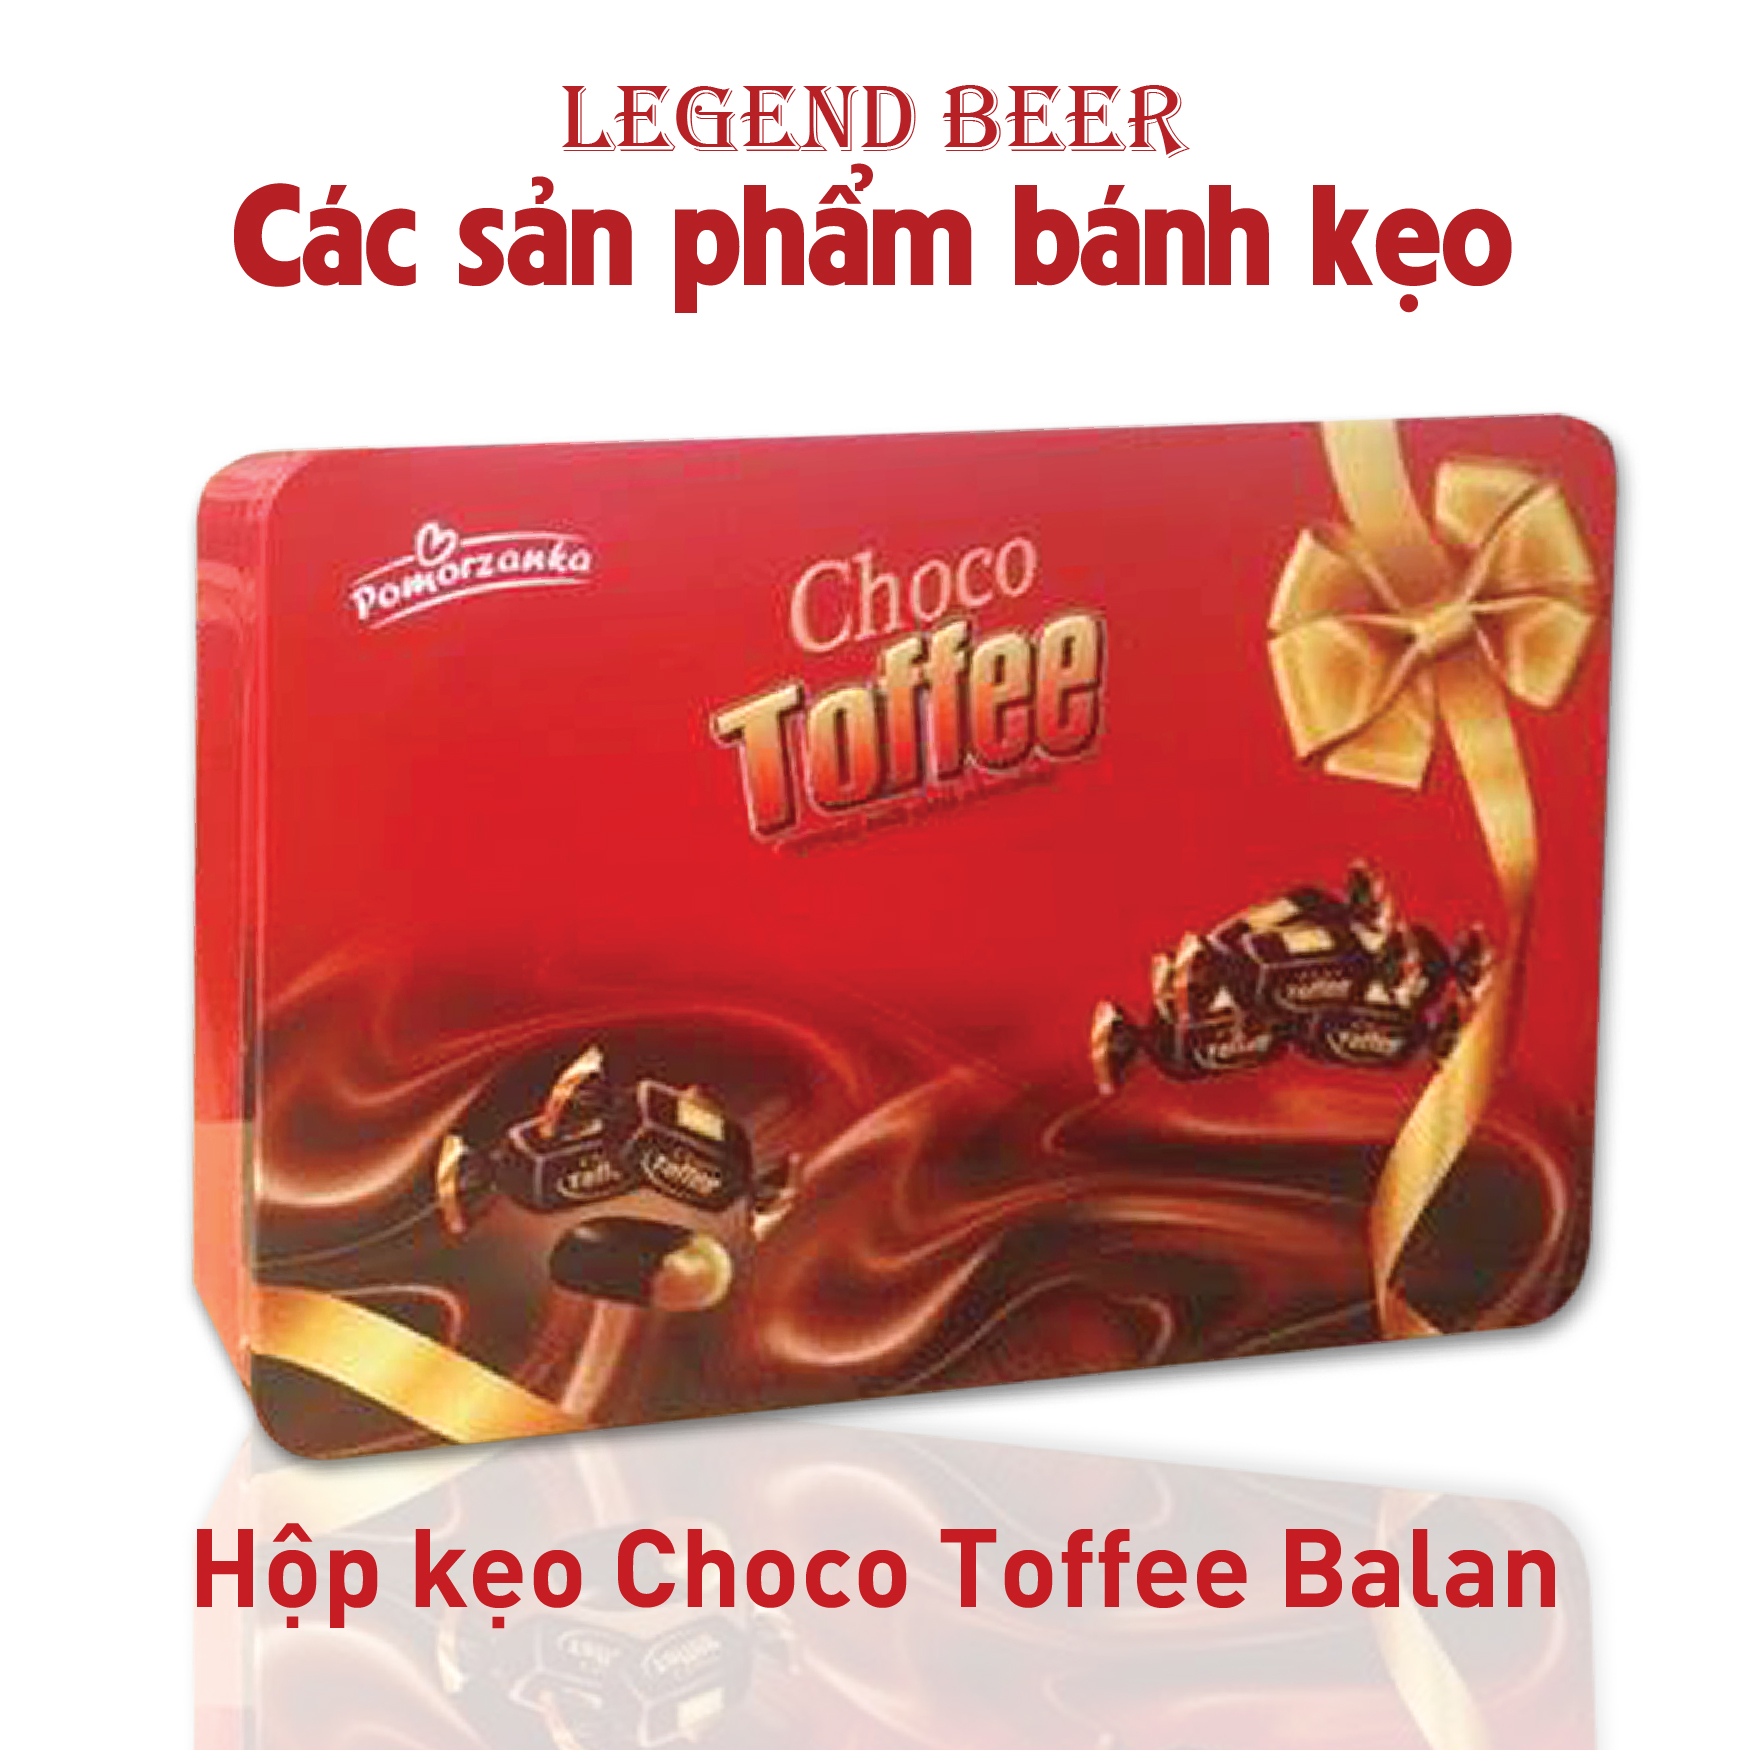 Hộp kẹo Choco Toffee Balan